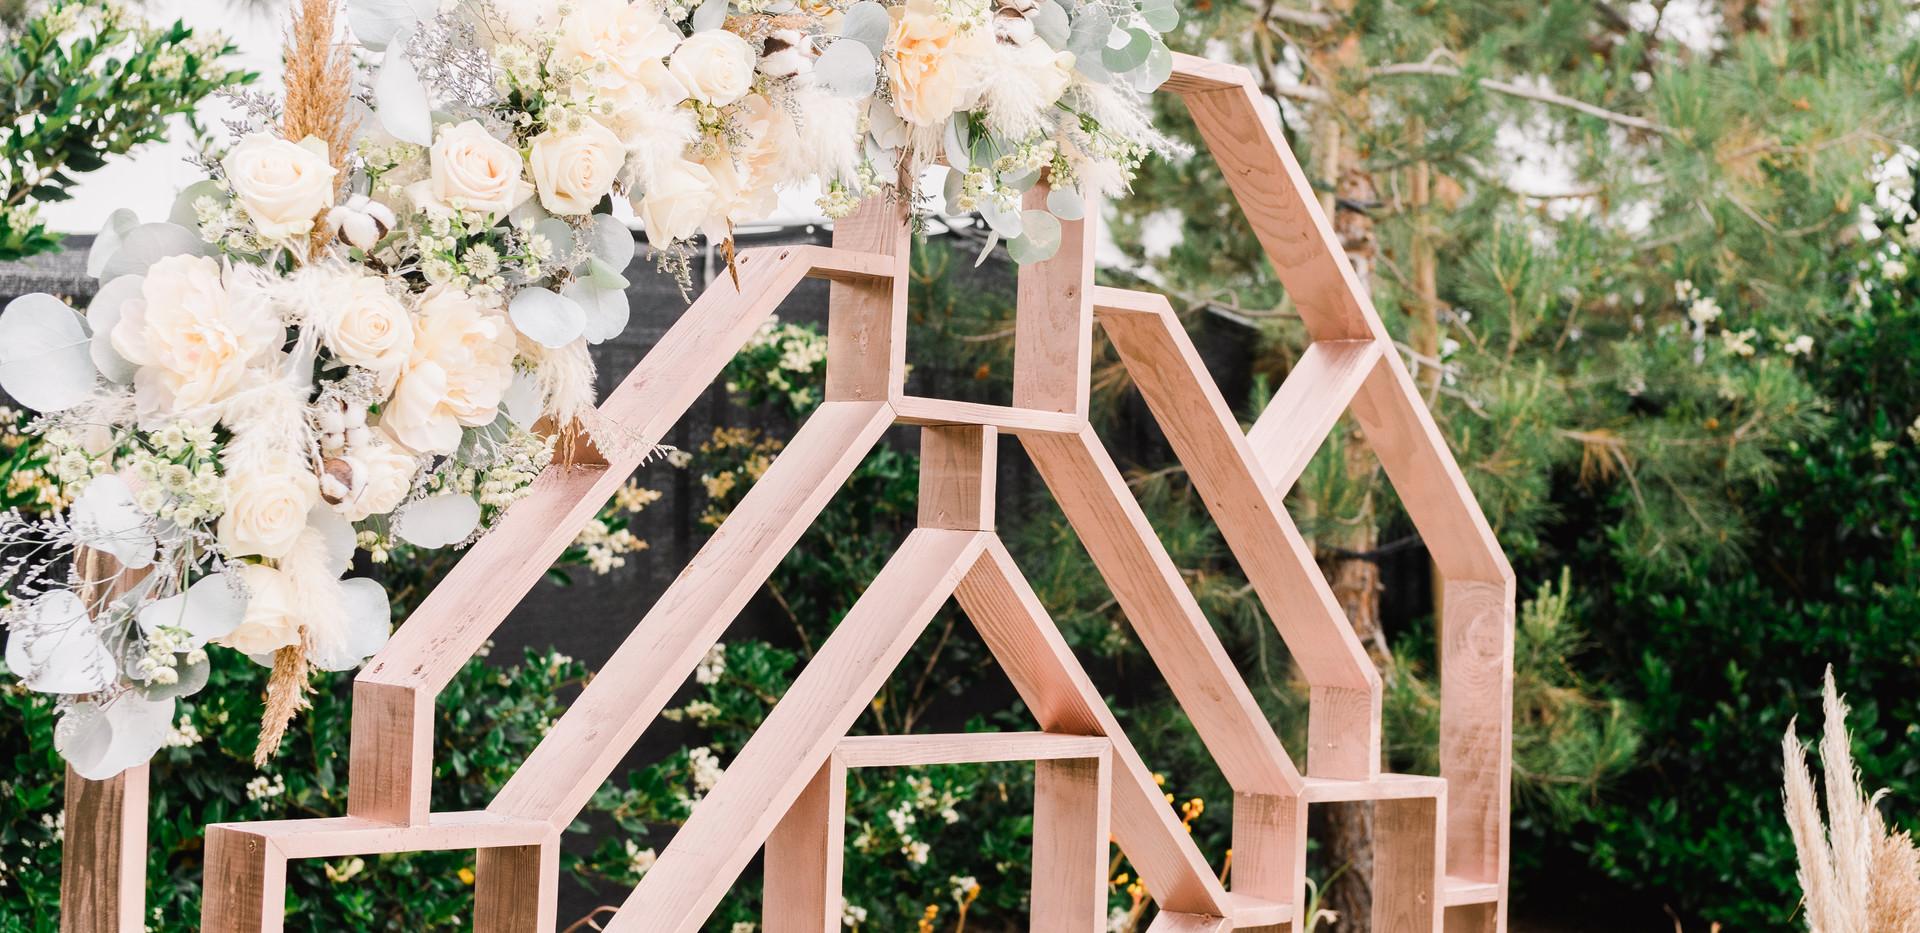 Newport Wedding Rentals